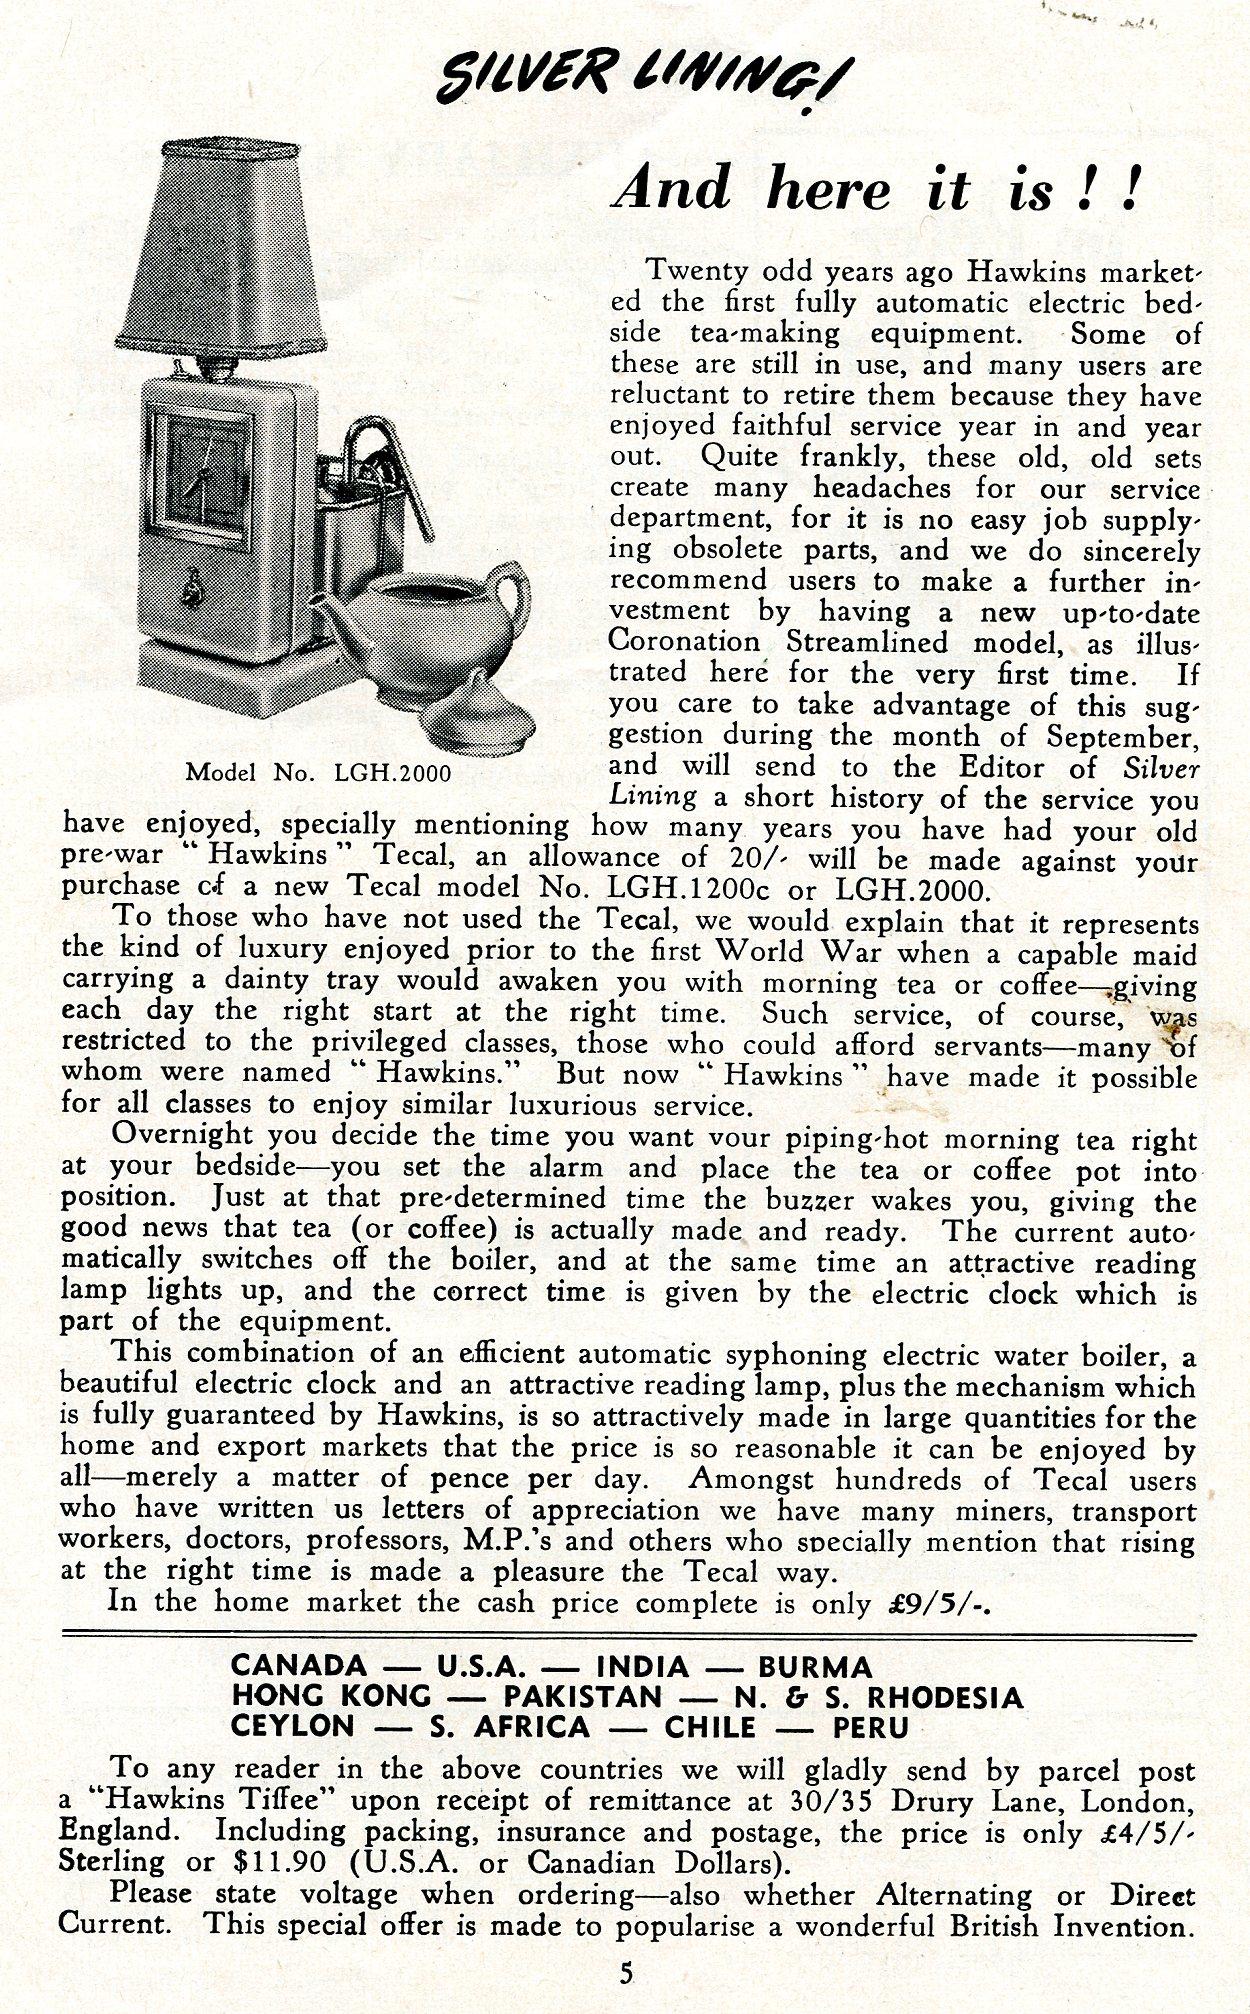 Hawkins Tecal Coronation 2000 advert Silver Lining Sep 1953